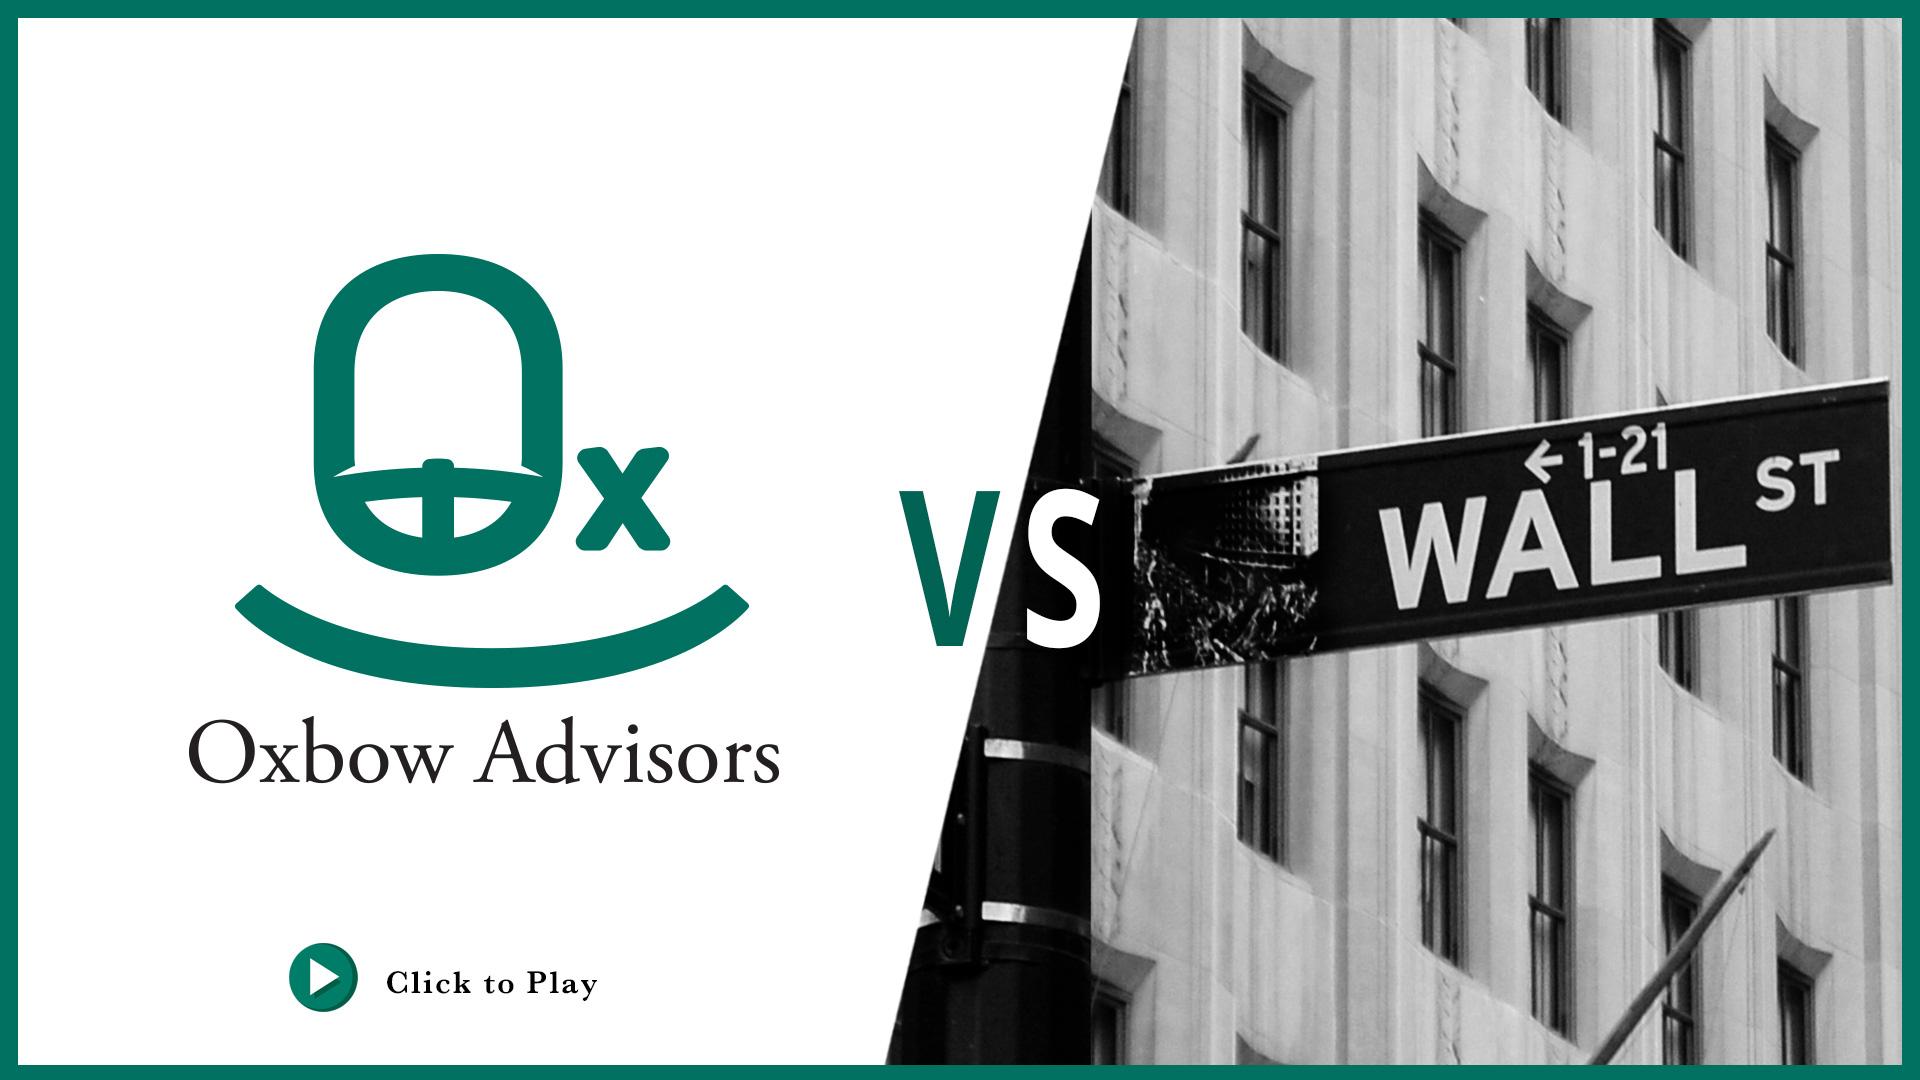 akley-Oxbow-Advisors-VS-Wallstreet-video-link